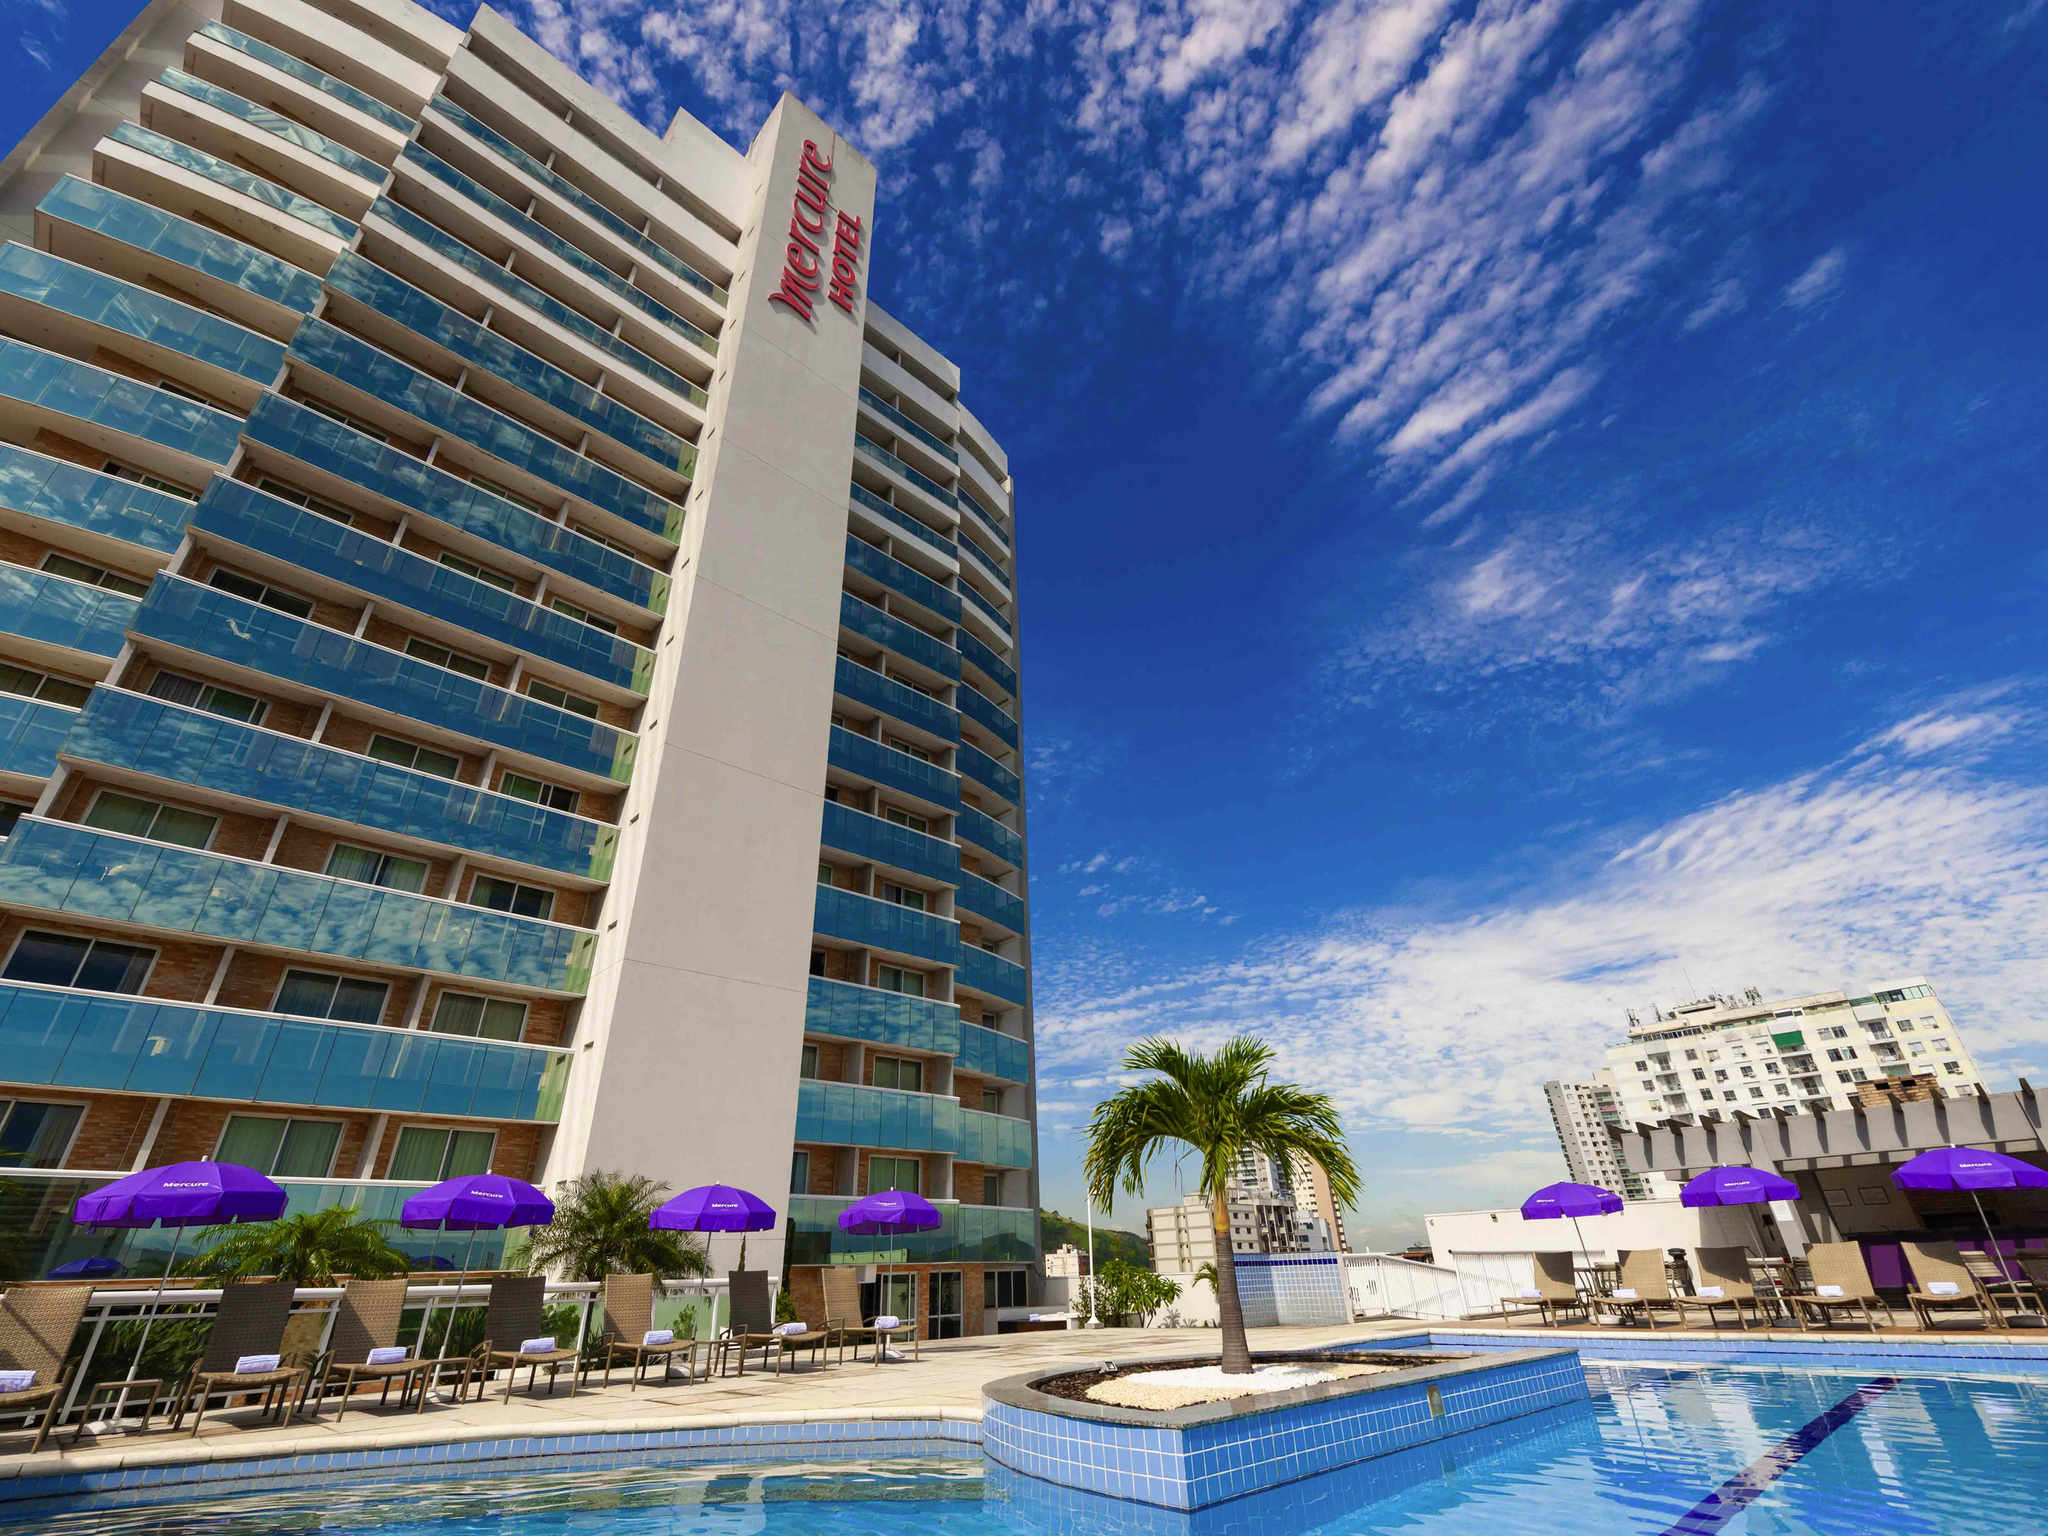 Otel – Mercure Rio de Janeiro Nova Iguacu Hotel